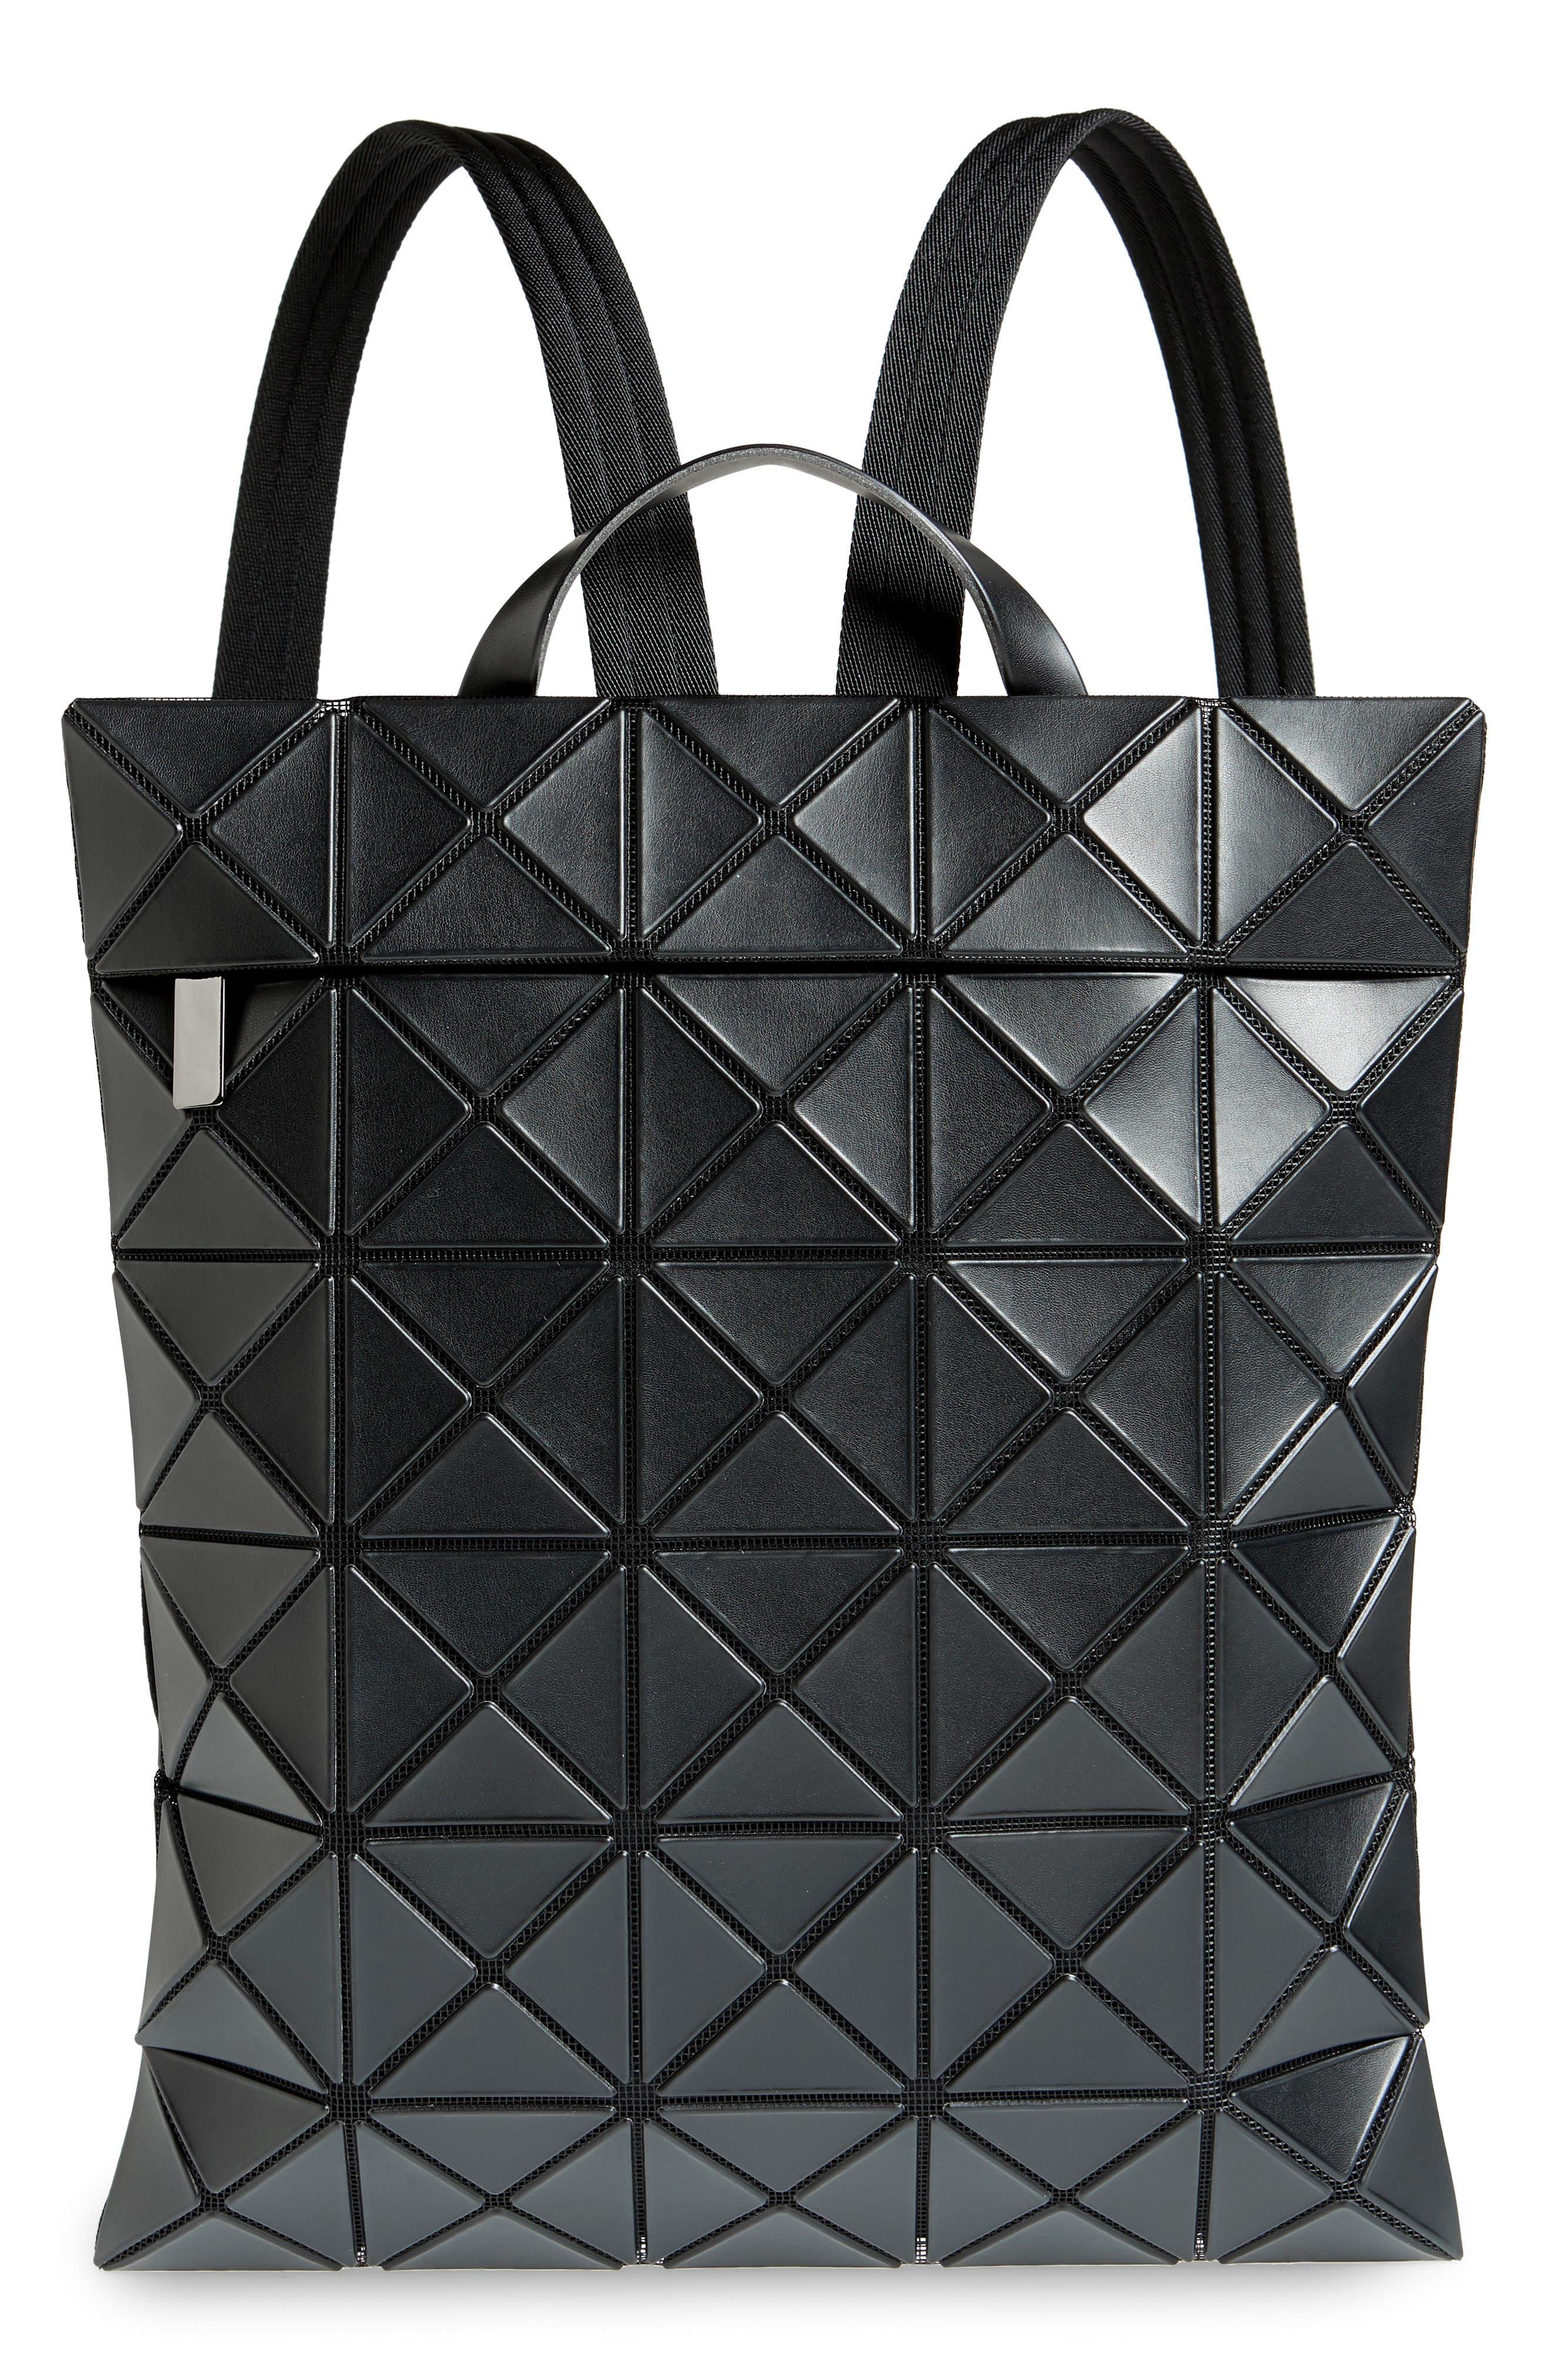 BAO BAO ISSEY MIYAKE Flat Backpack, Main, color, MATTE BLACK